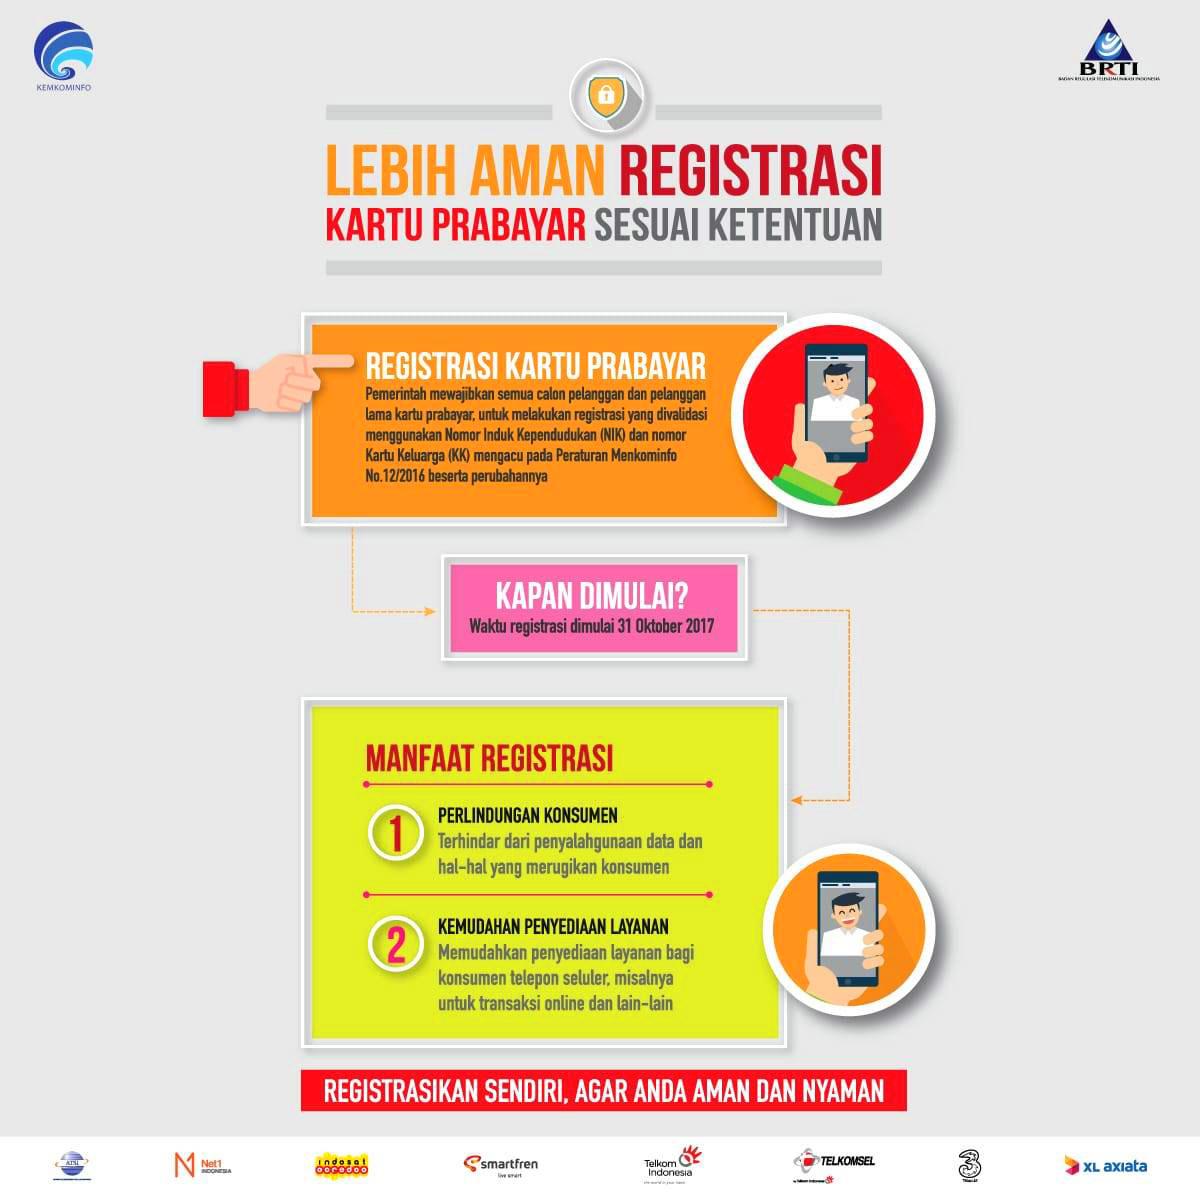 Cara Registrasi Ulang Kartu SIM Prabayar